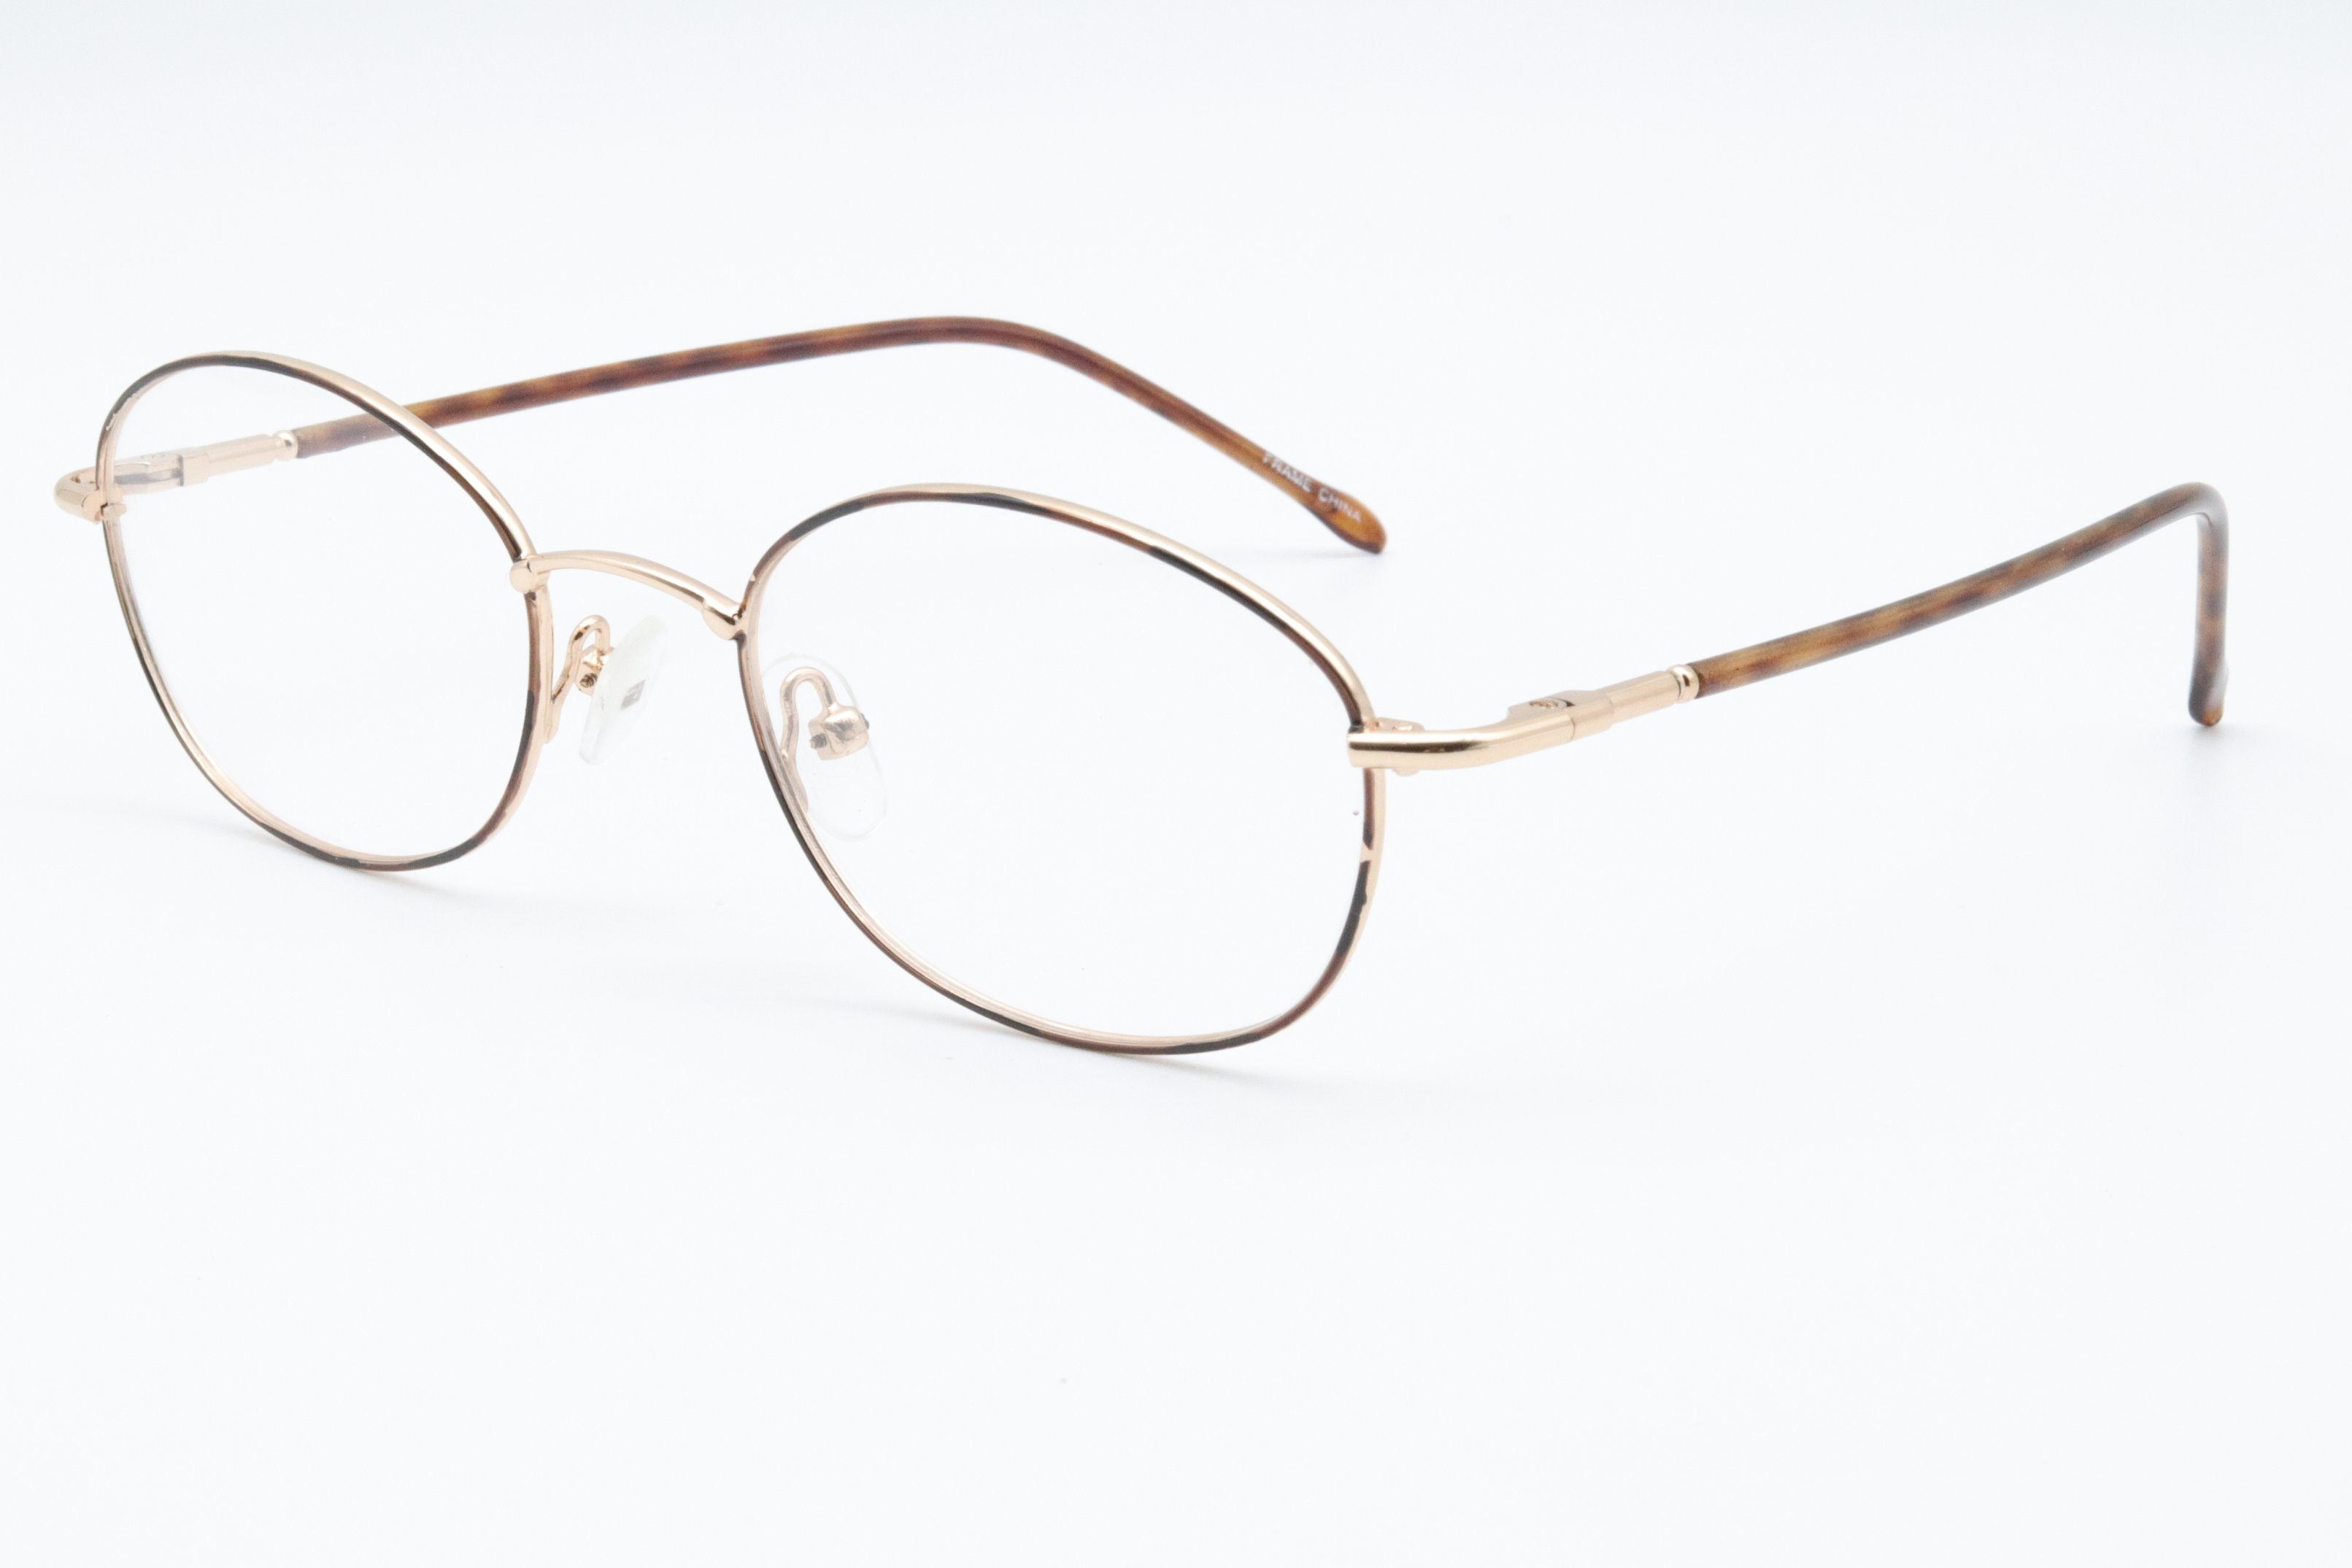 a3b2a59e9a7 Popular and Classic America Standard Flexible Metal Optical Frames  Eyeglasses Eyewear Spectacles Fp82